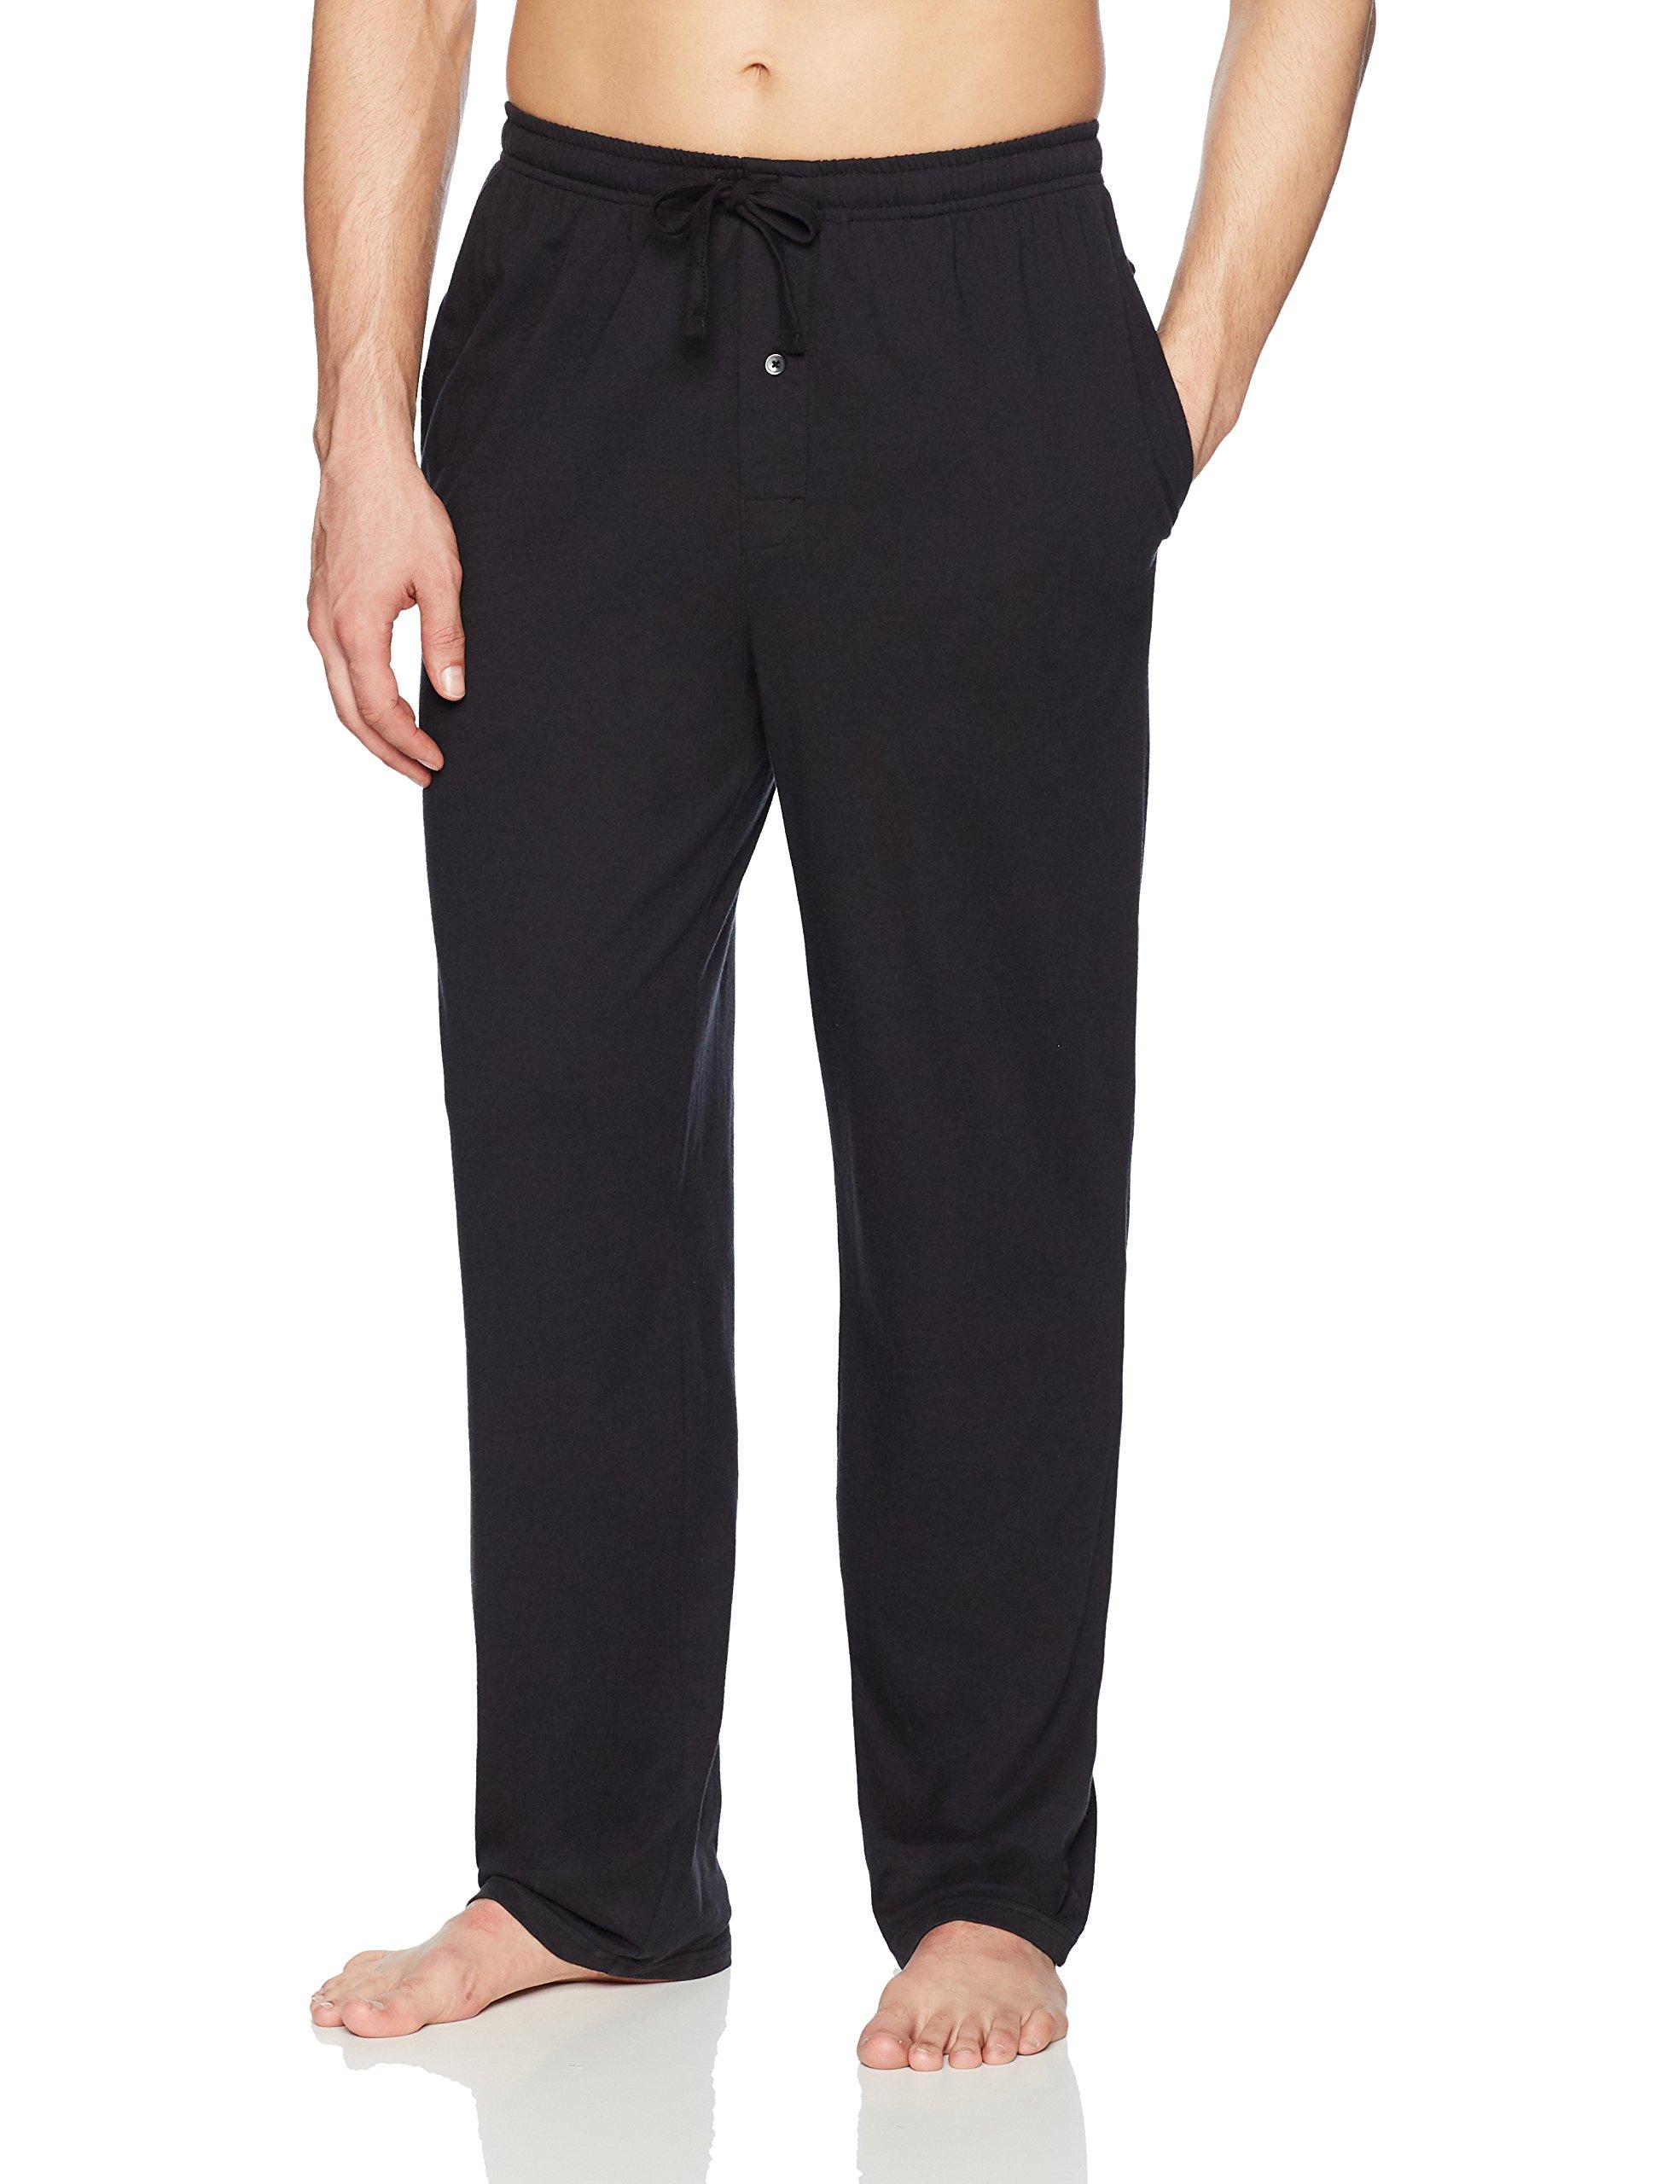 Amazon Essentials Men's Knit Pajama Pant, Black, Large